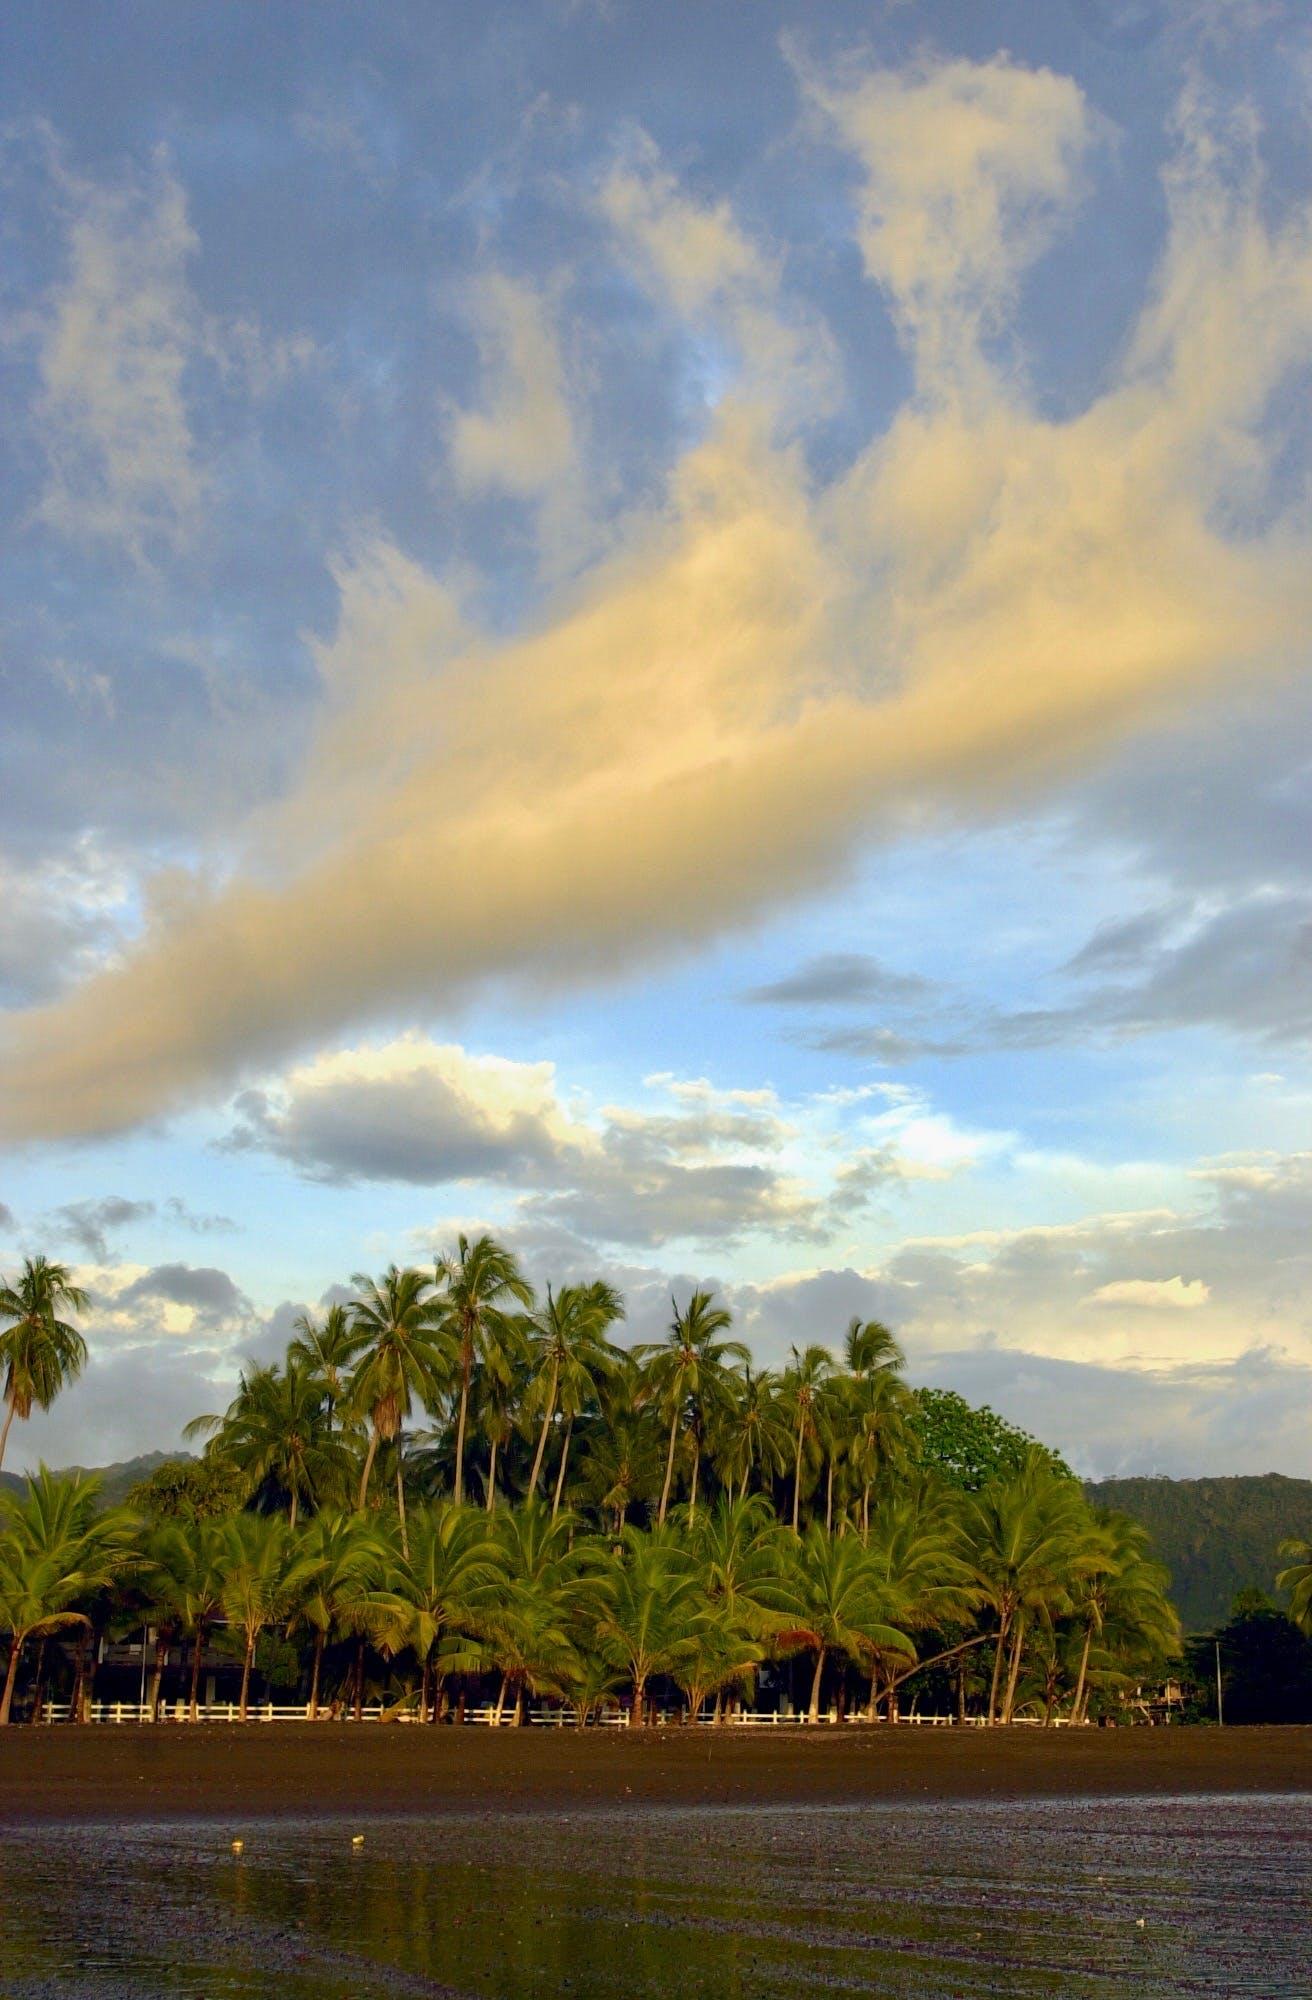 Free stock photo of Costa_Rica, nuves, palmeras, playa